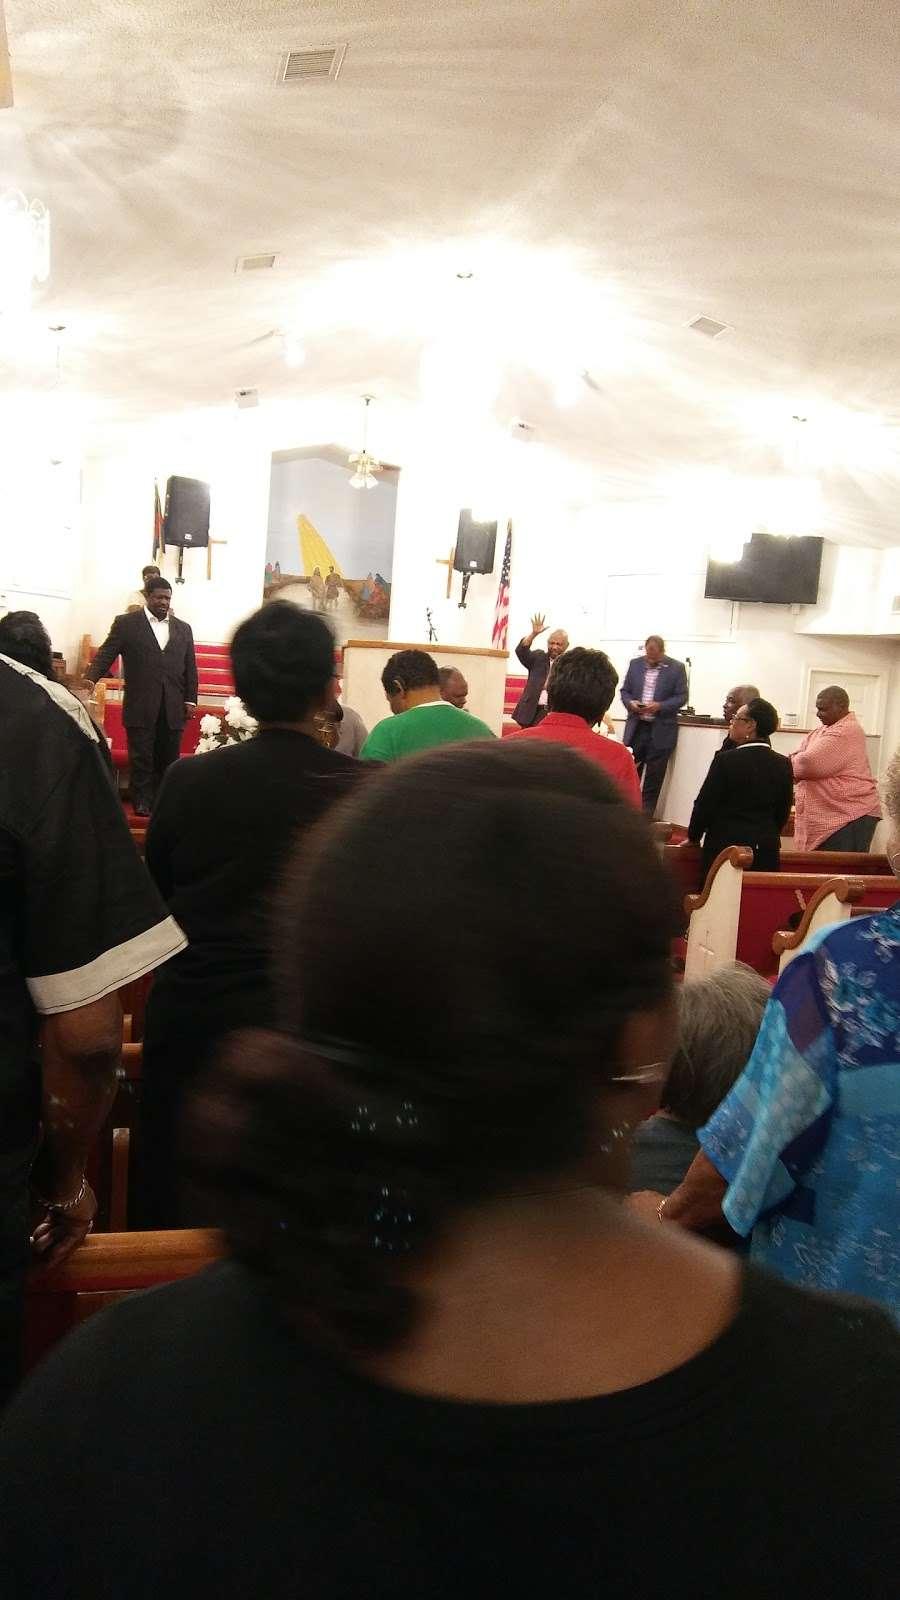 Bethany Missionary Baptist Church - church  | Photo 7 of 8 | Address: Houston, TX 77009, USA | Phone: (713) 224-9813